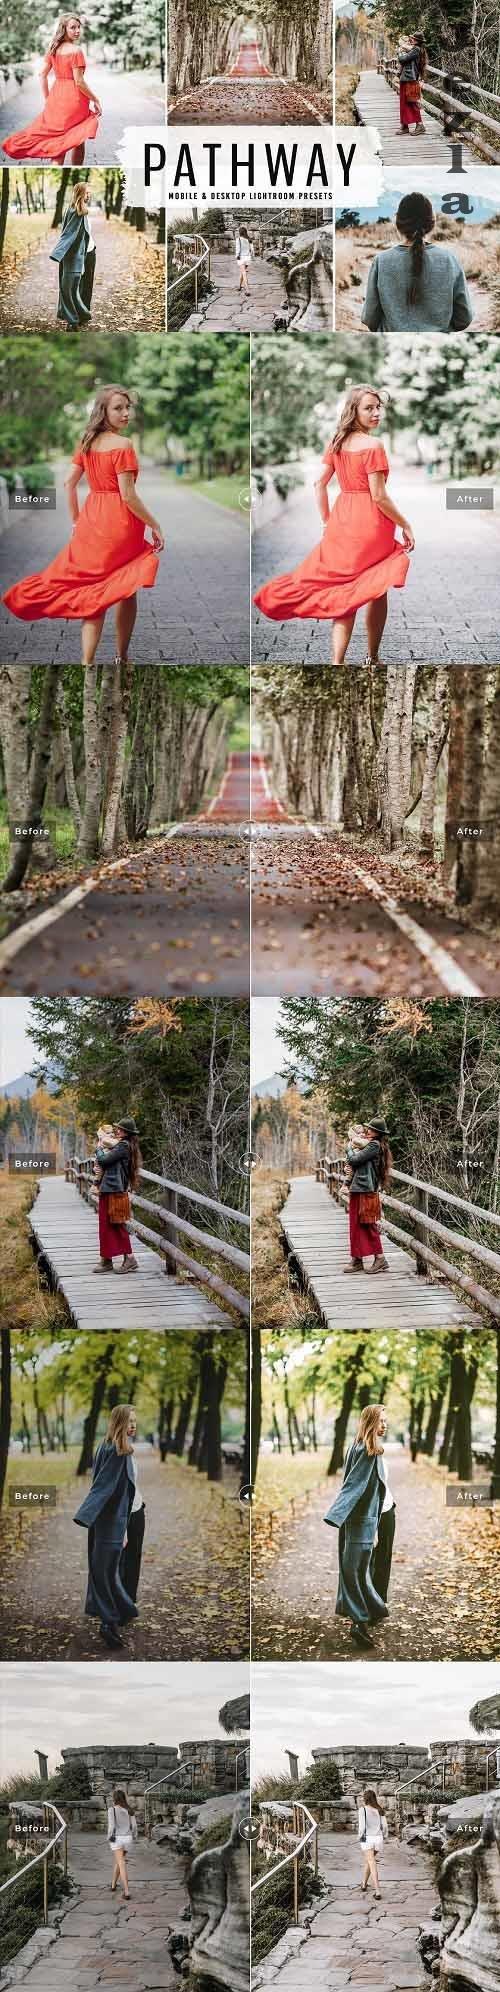 Pathway Pro LRM Presets - 6517613